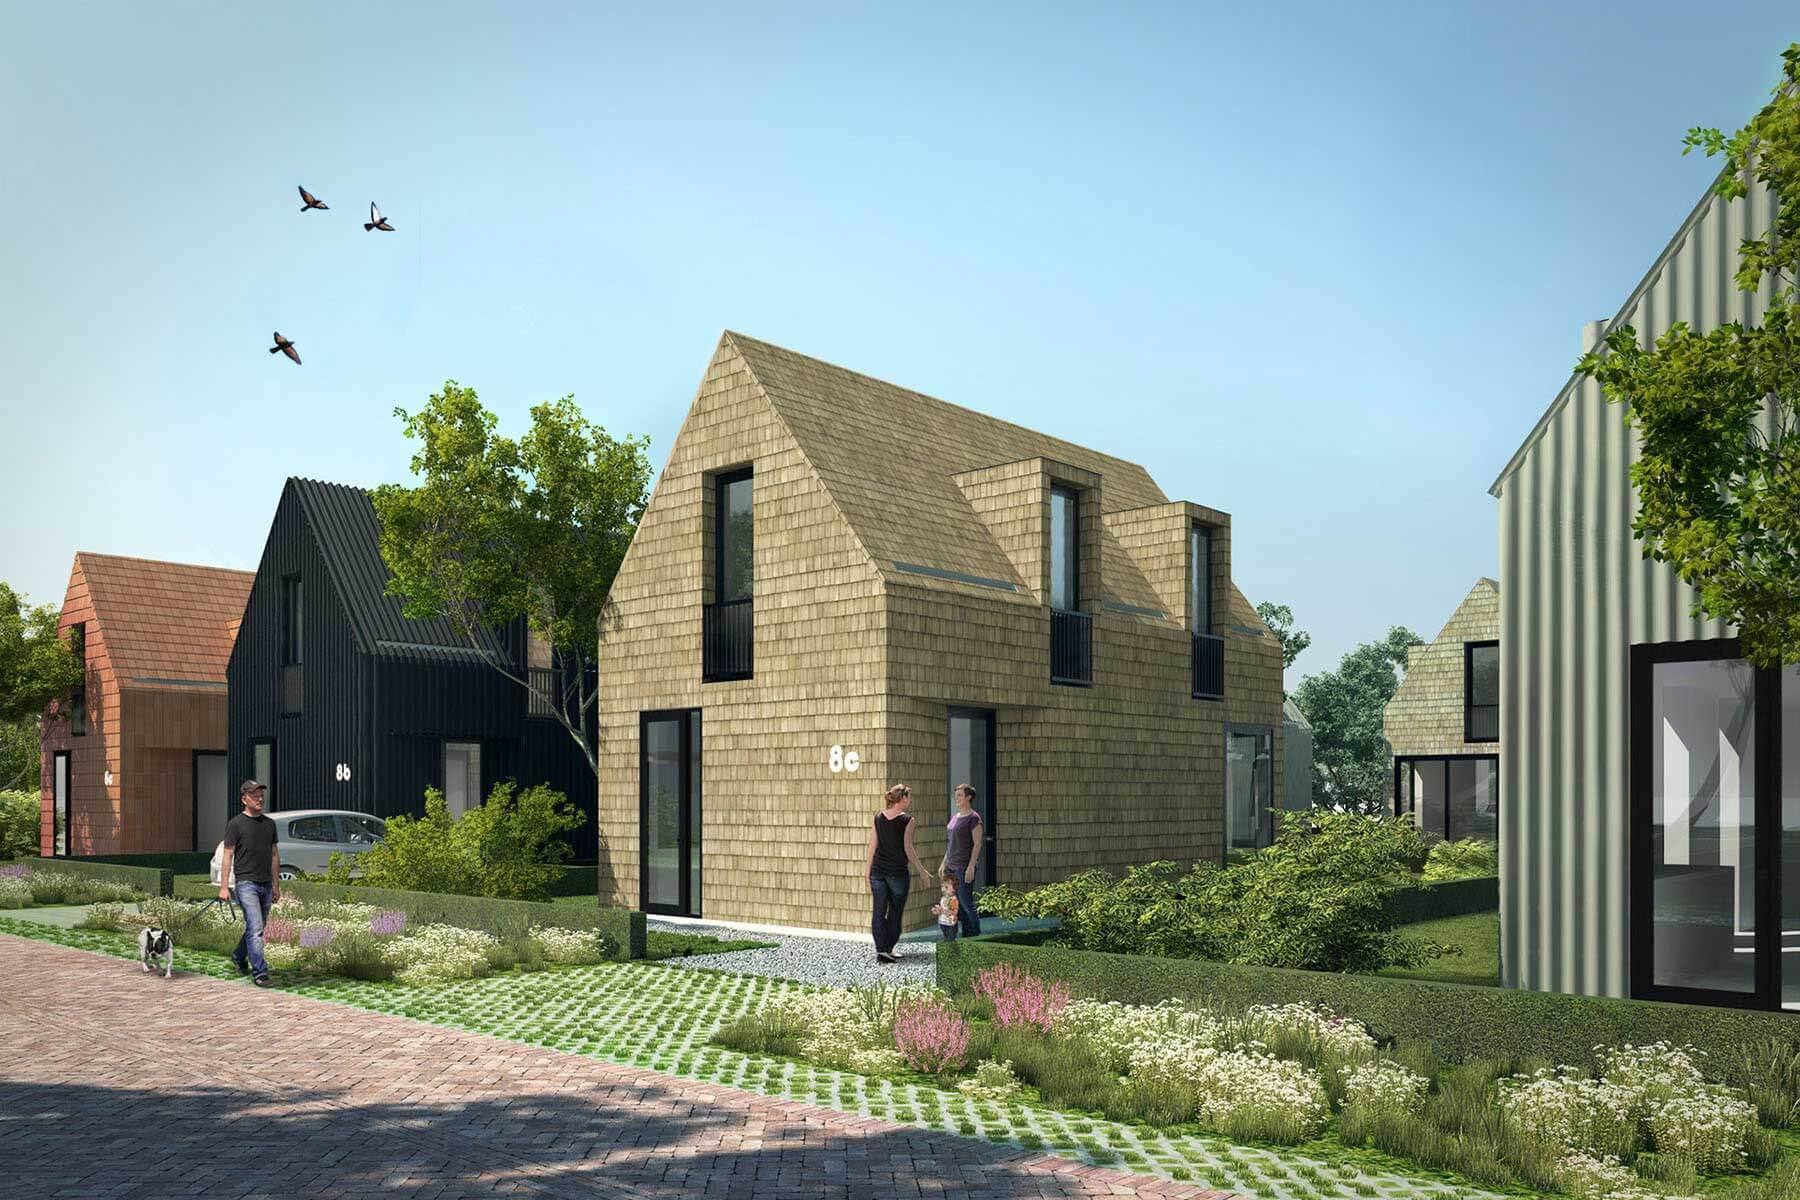 8A Architecten - Zelfbouw woning Datcha house